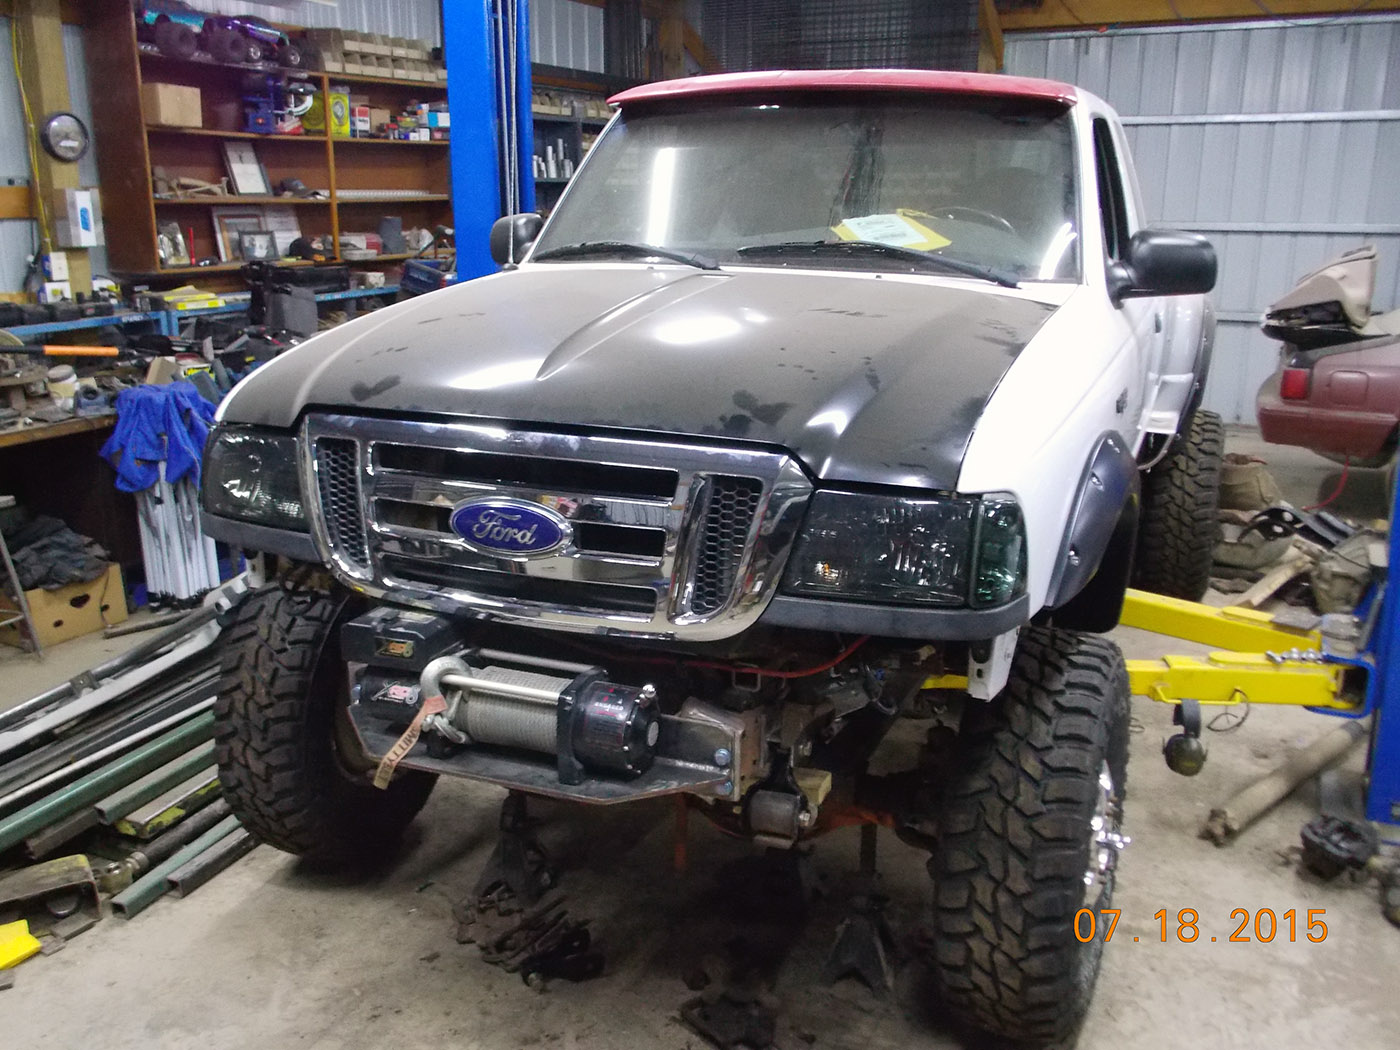 Ford Ranger 4 4 With A Cummins 4bt Diesel Inline Four Engine Swap Depot